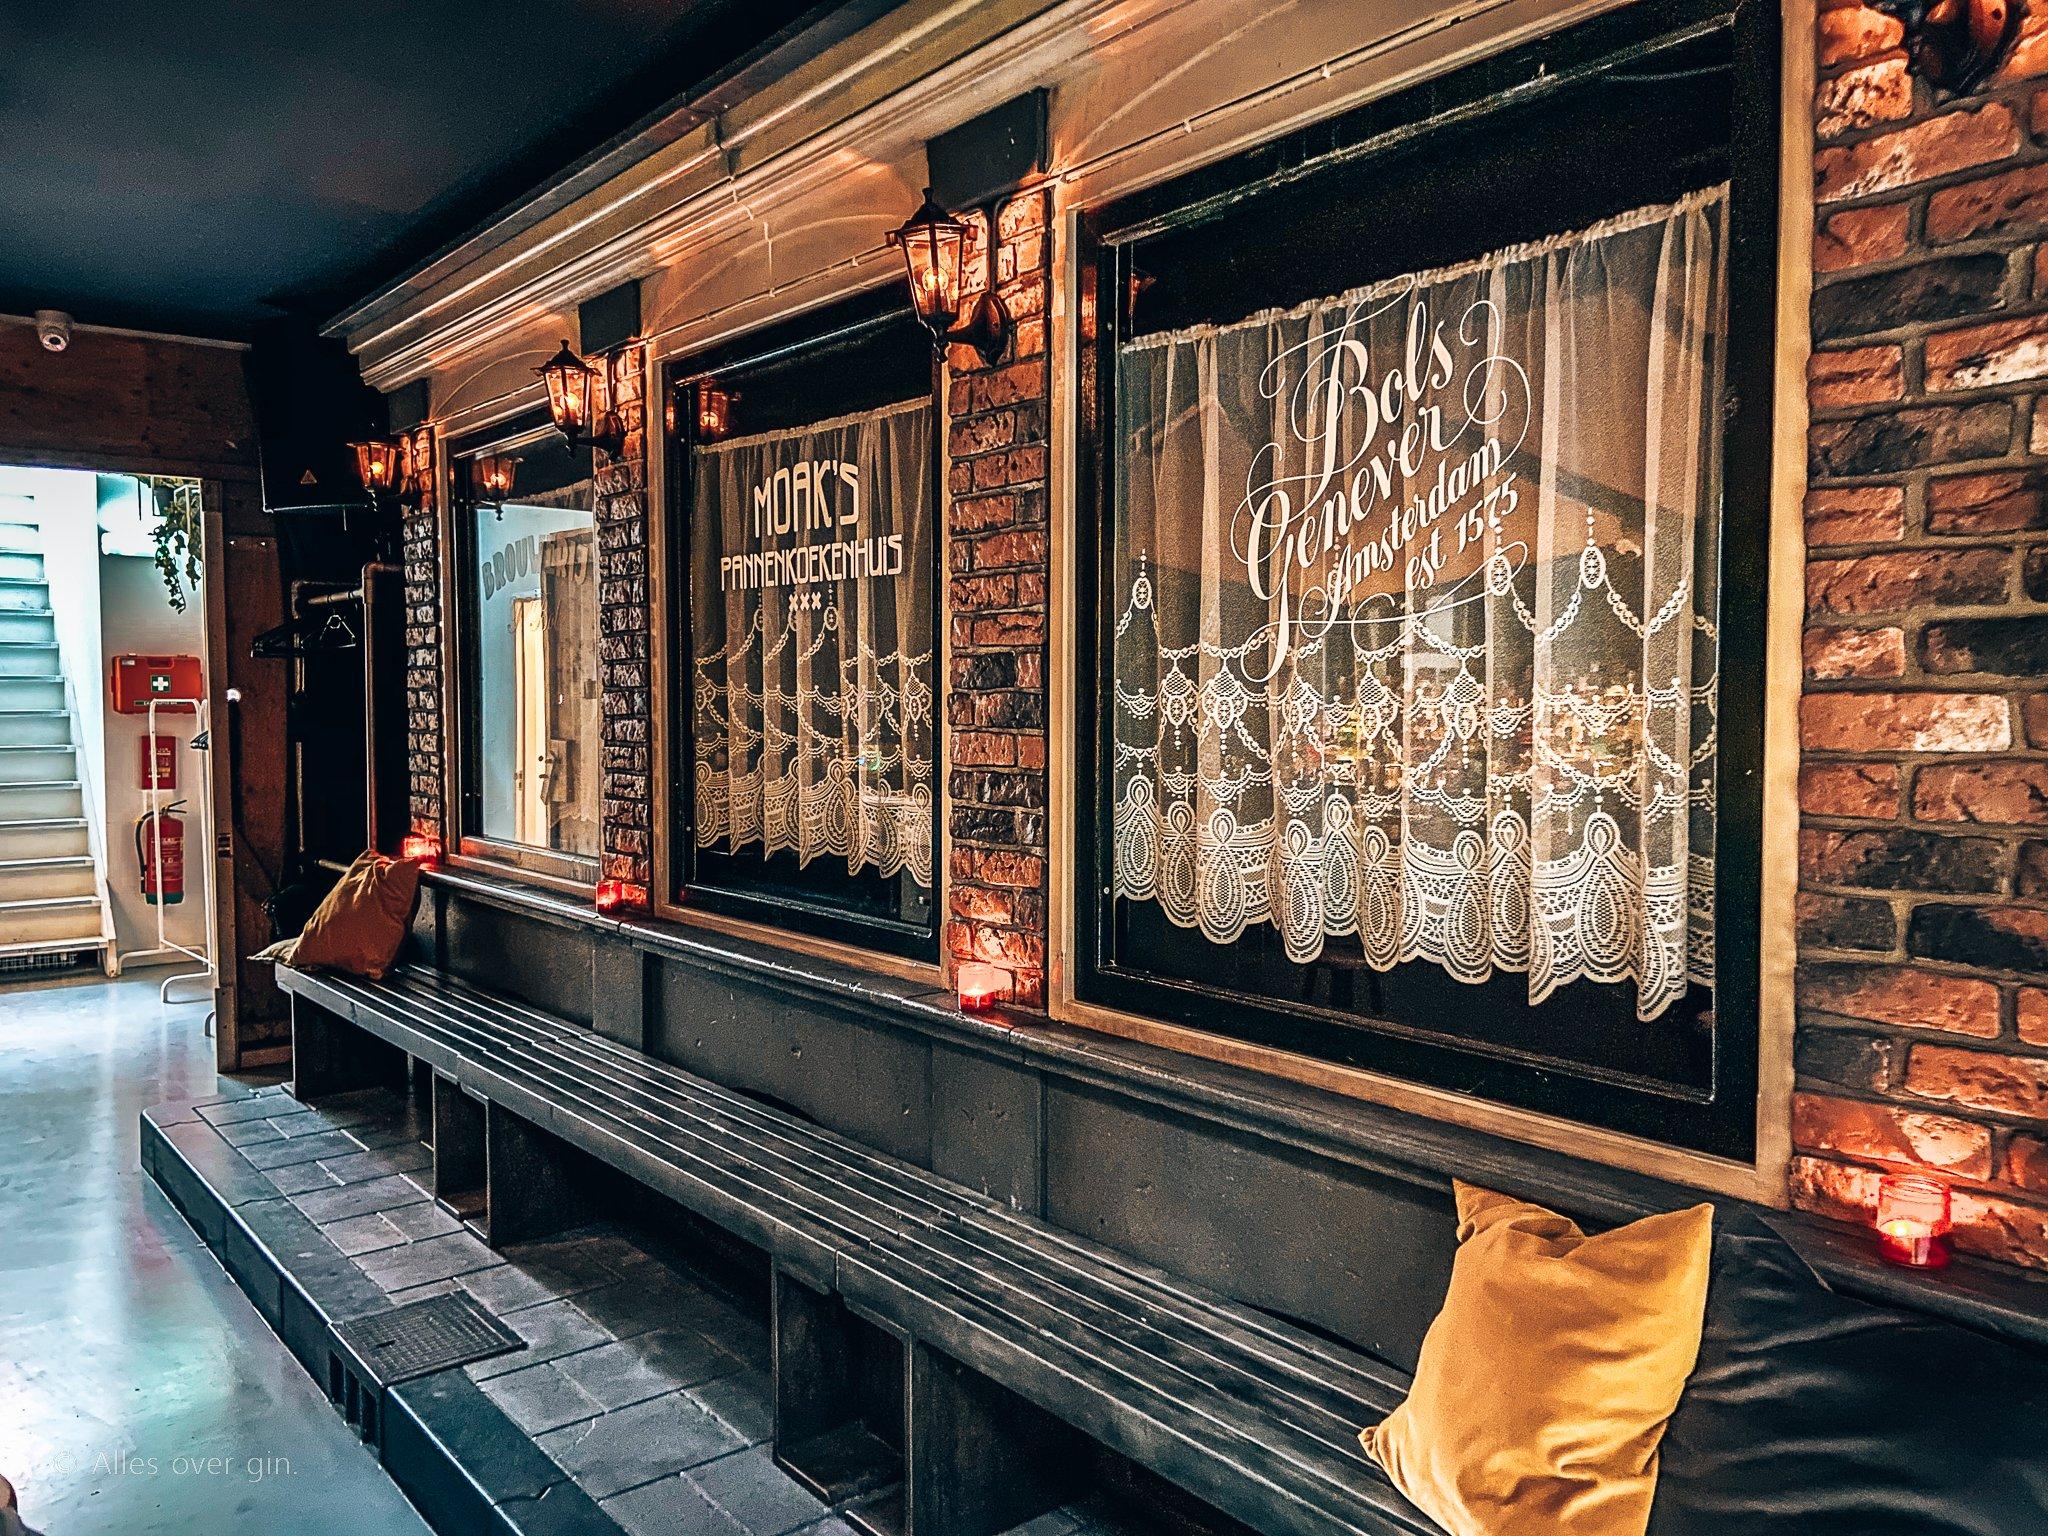 Bar Mokum, cocktailbar in een straat in Amsterdam, Alles over gin.